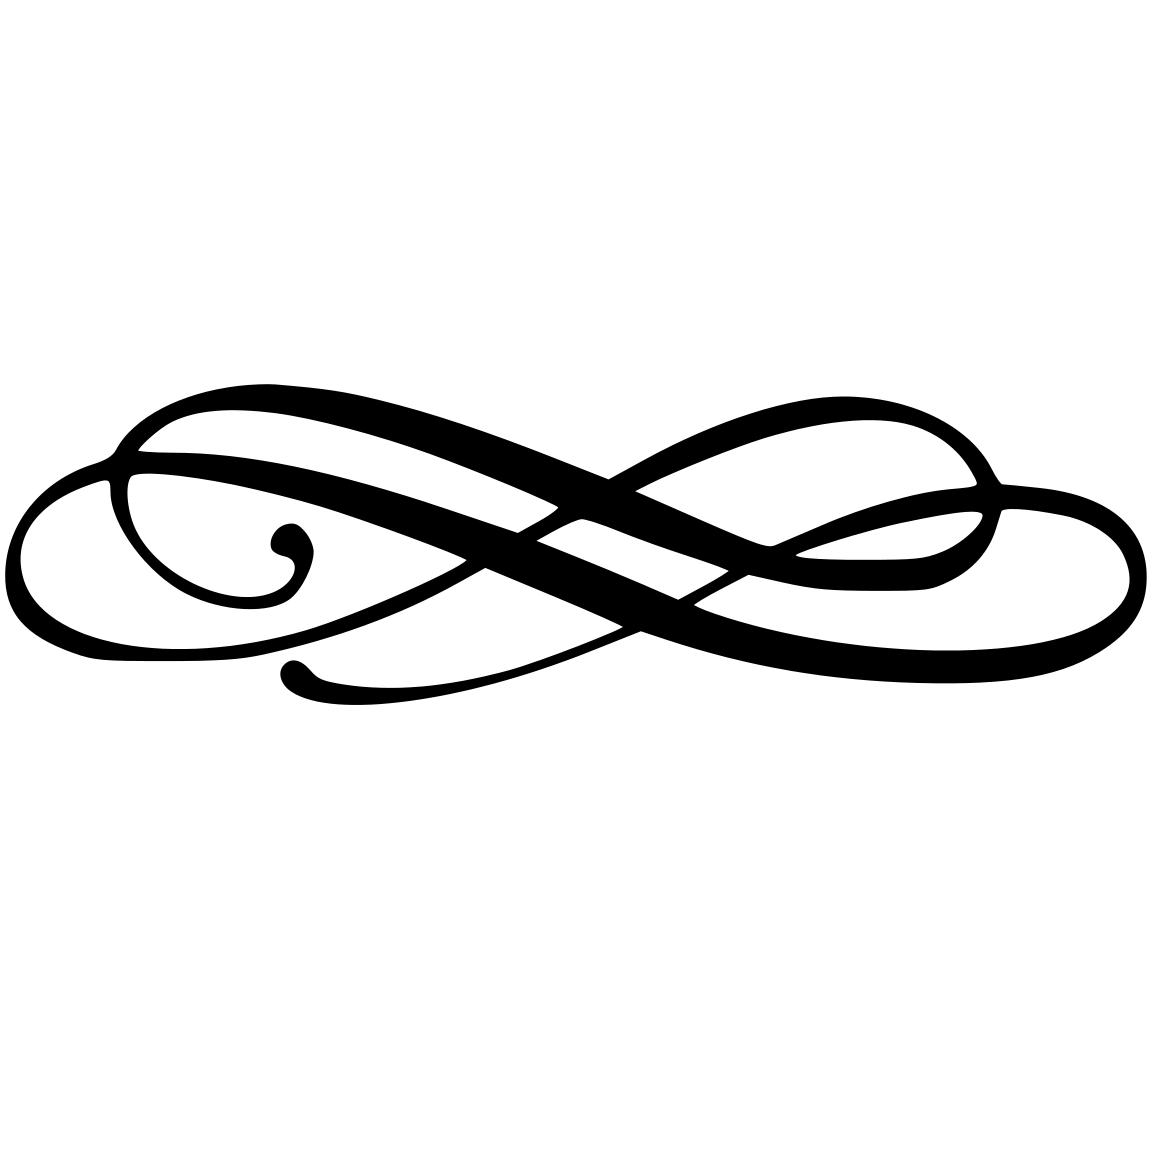 Free simple flourish cliparts. Flourishes clipart logo